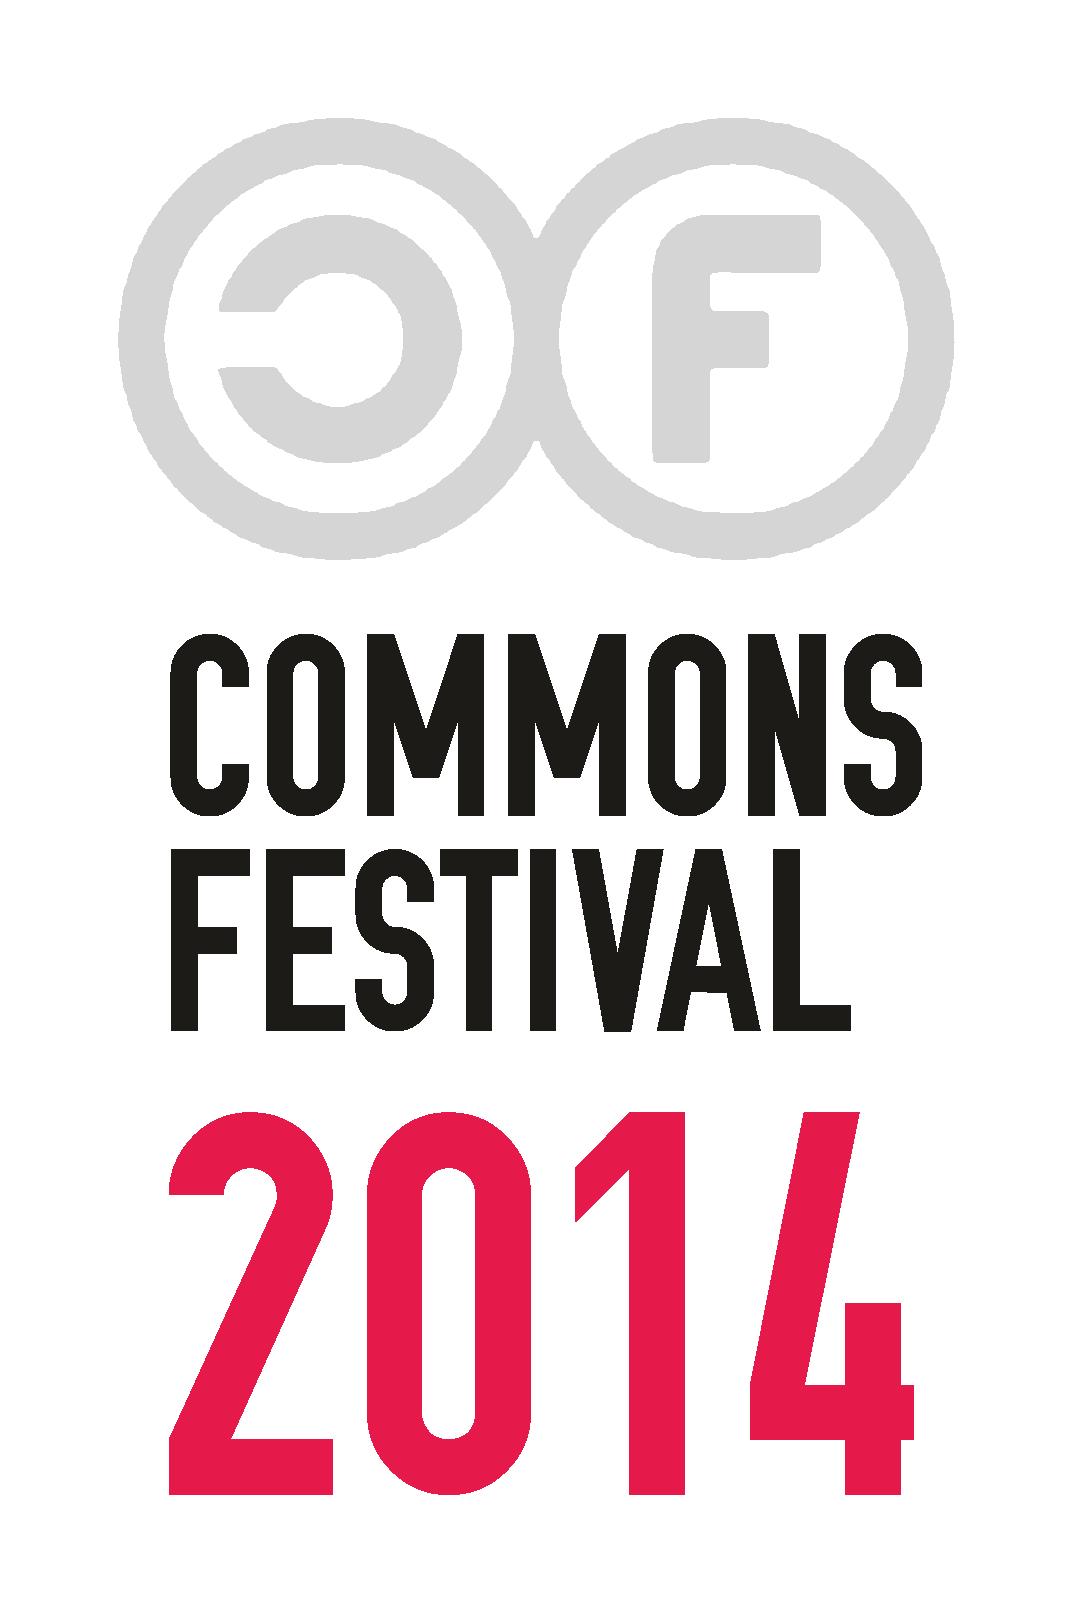 Commons Festival_ΛΟΓΟΤΥΠΟ_2014_Gray